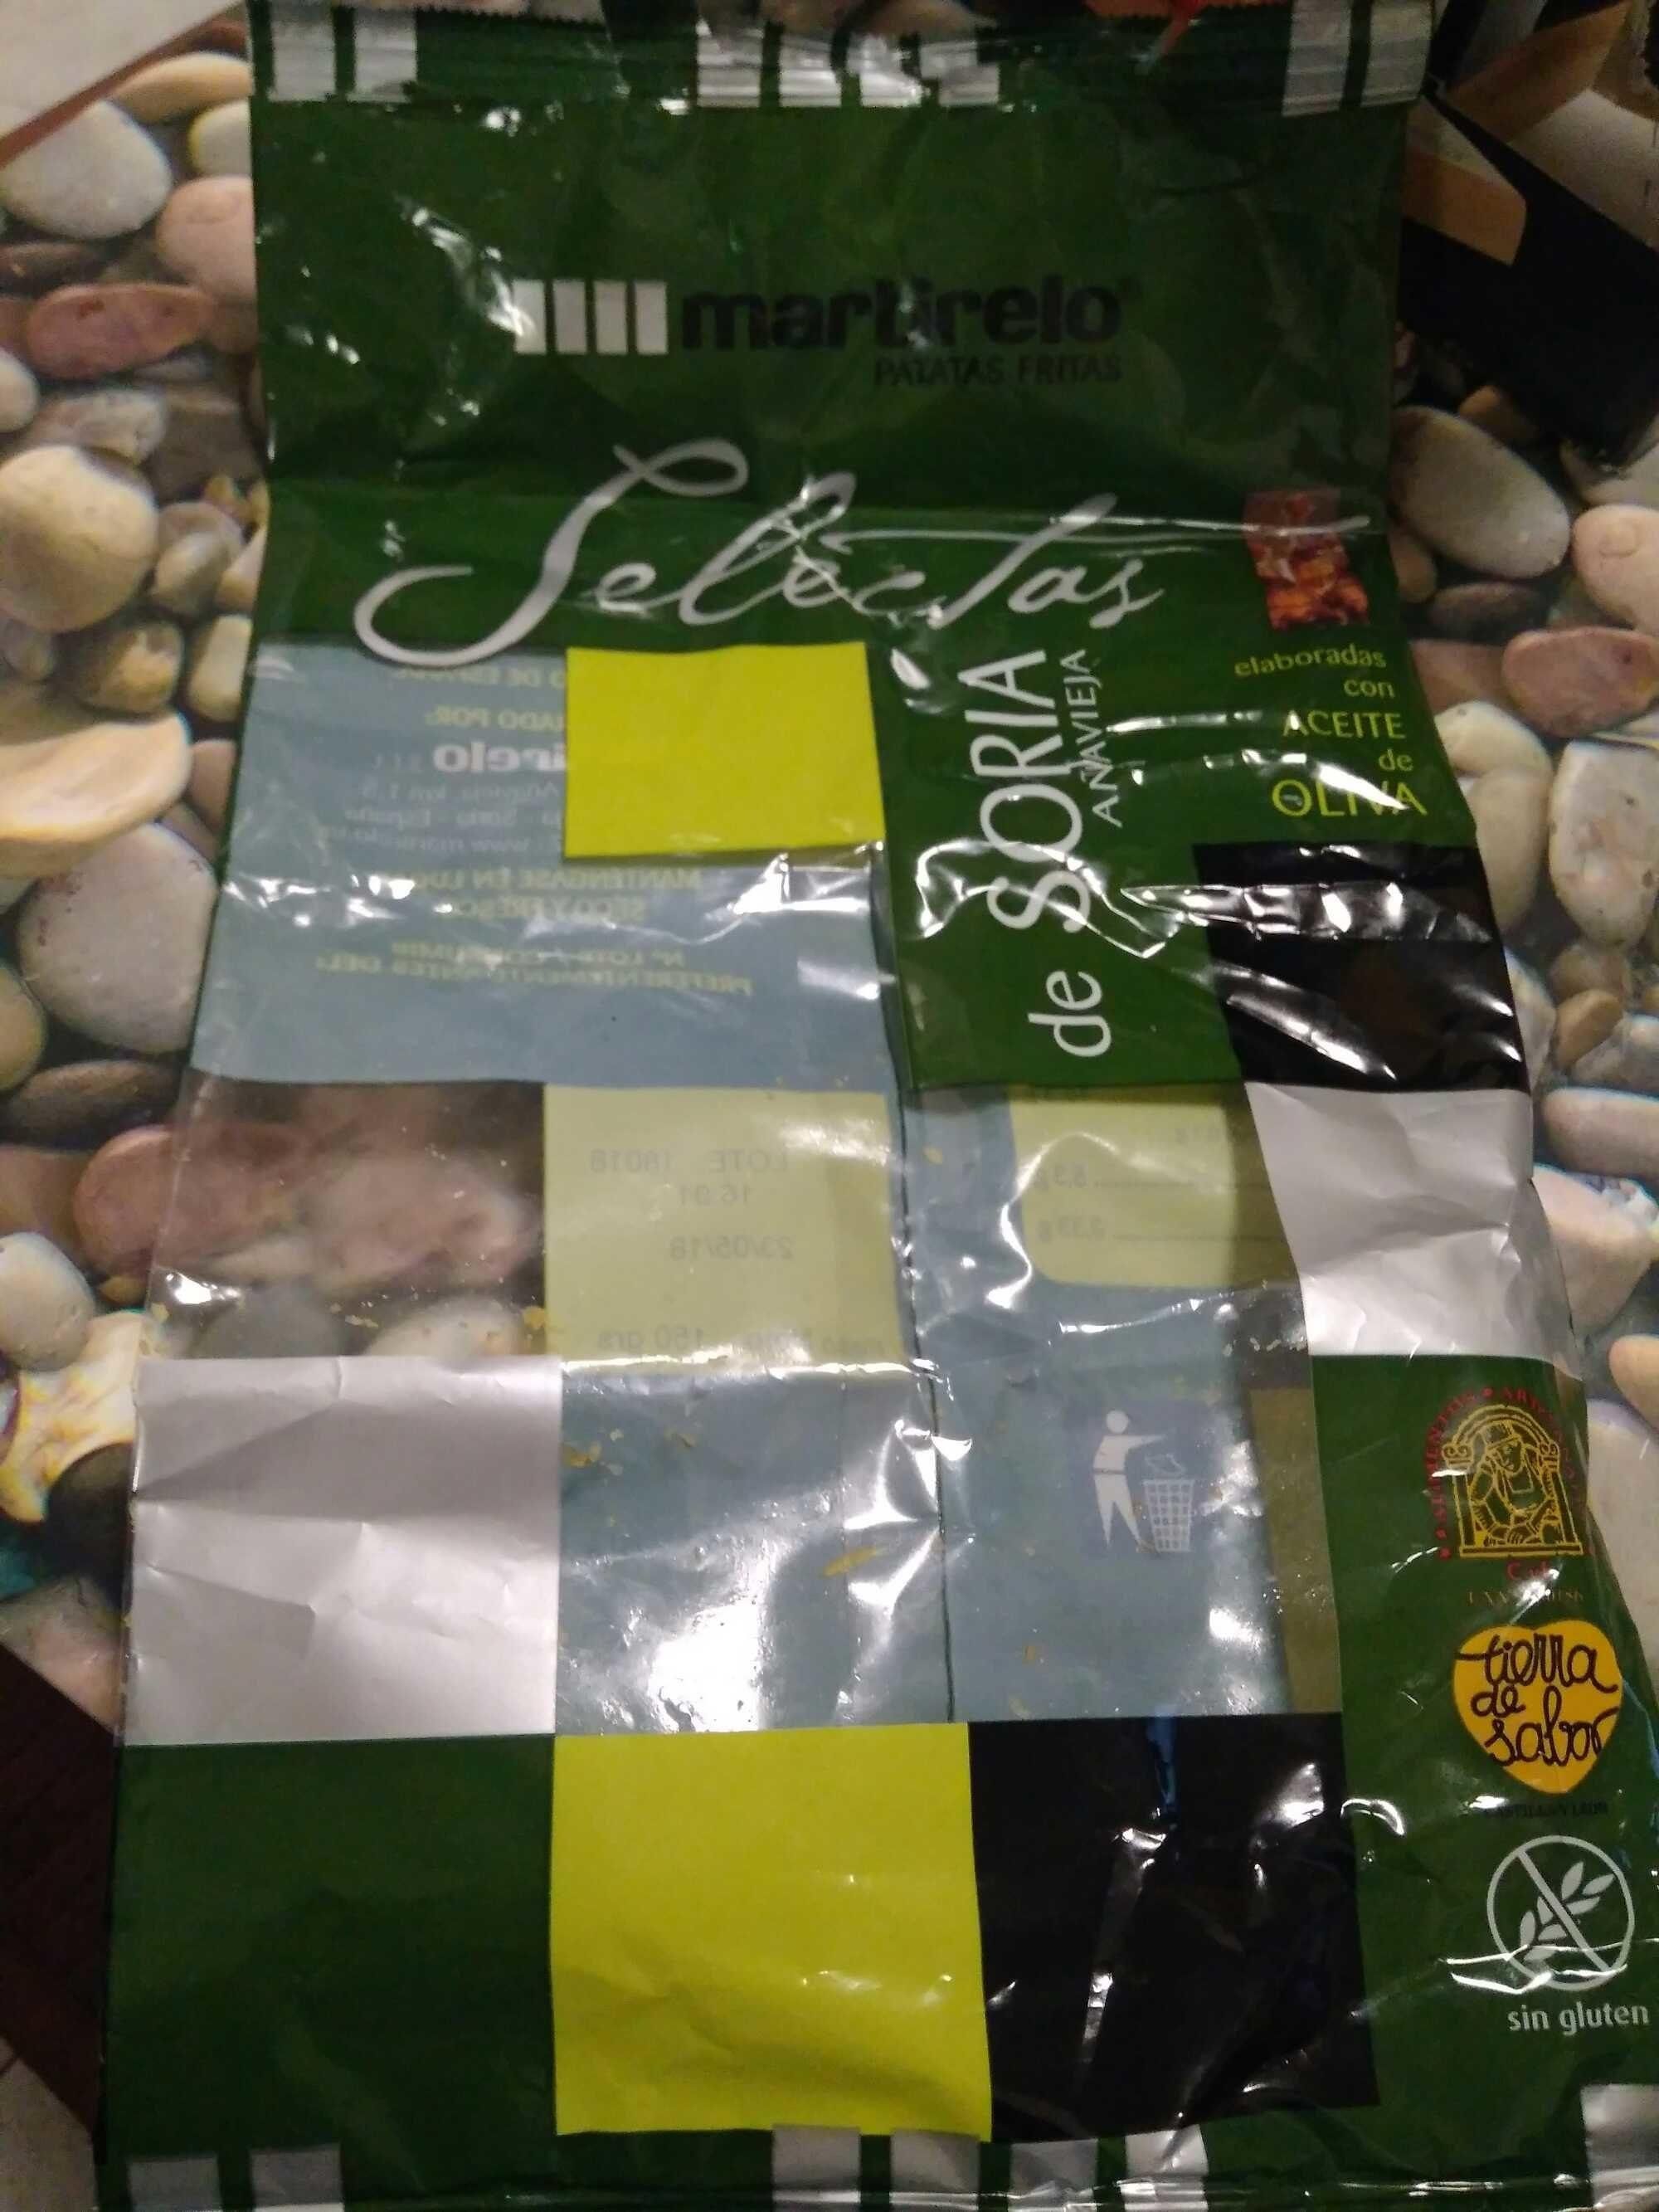 Patatas fritas Martirelo - Product